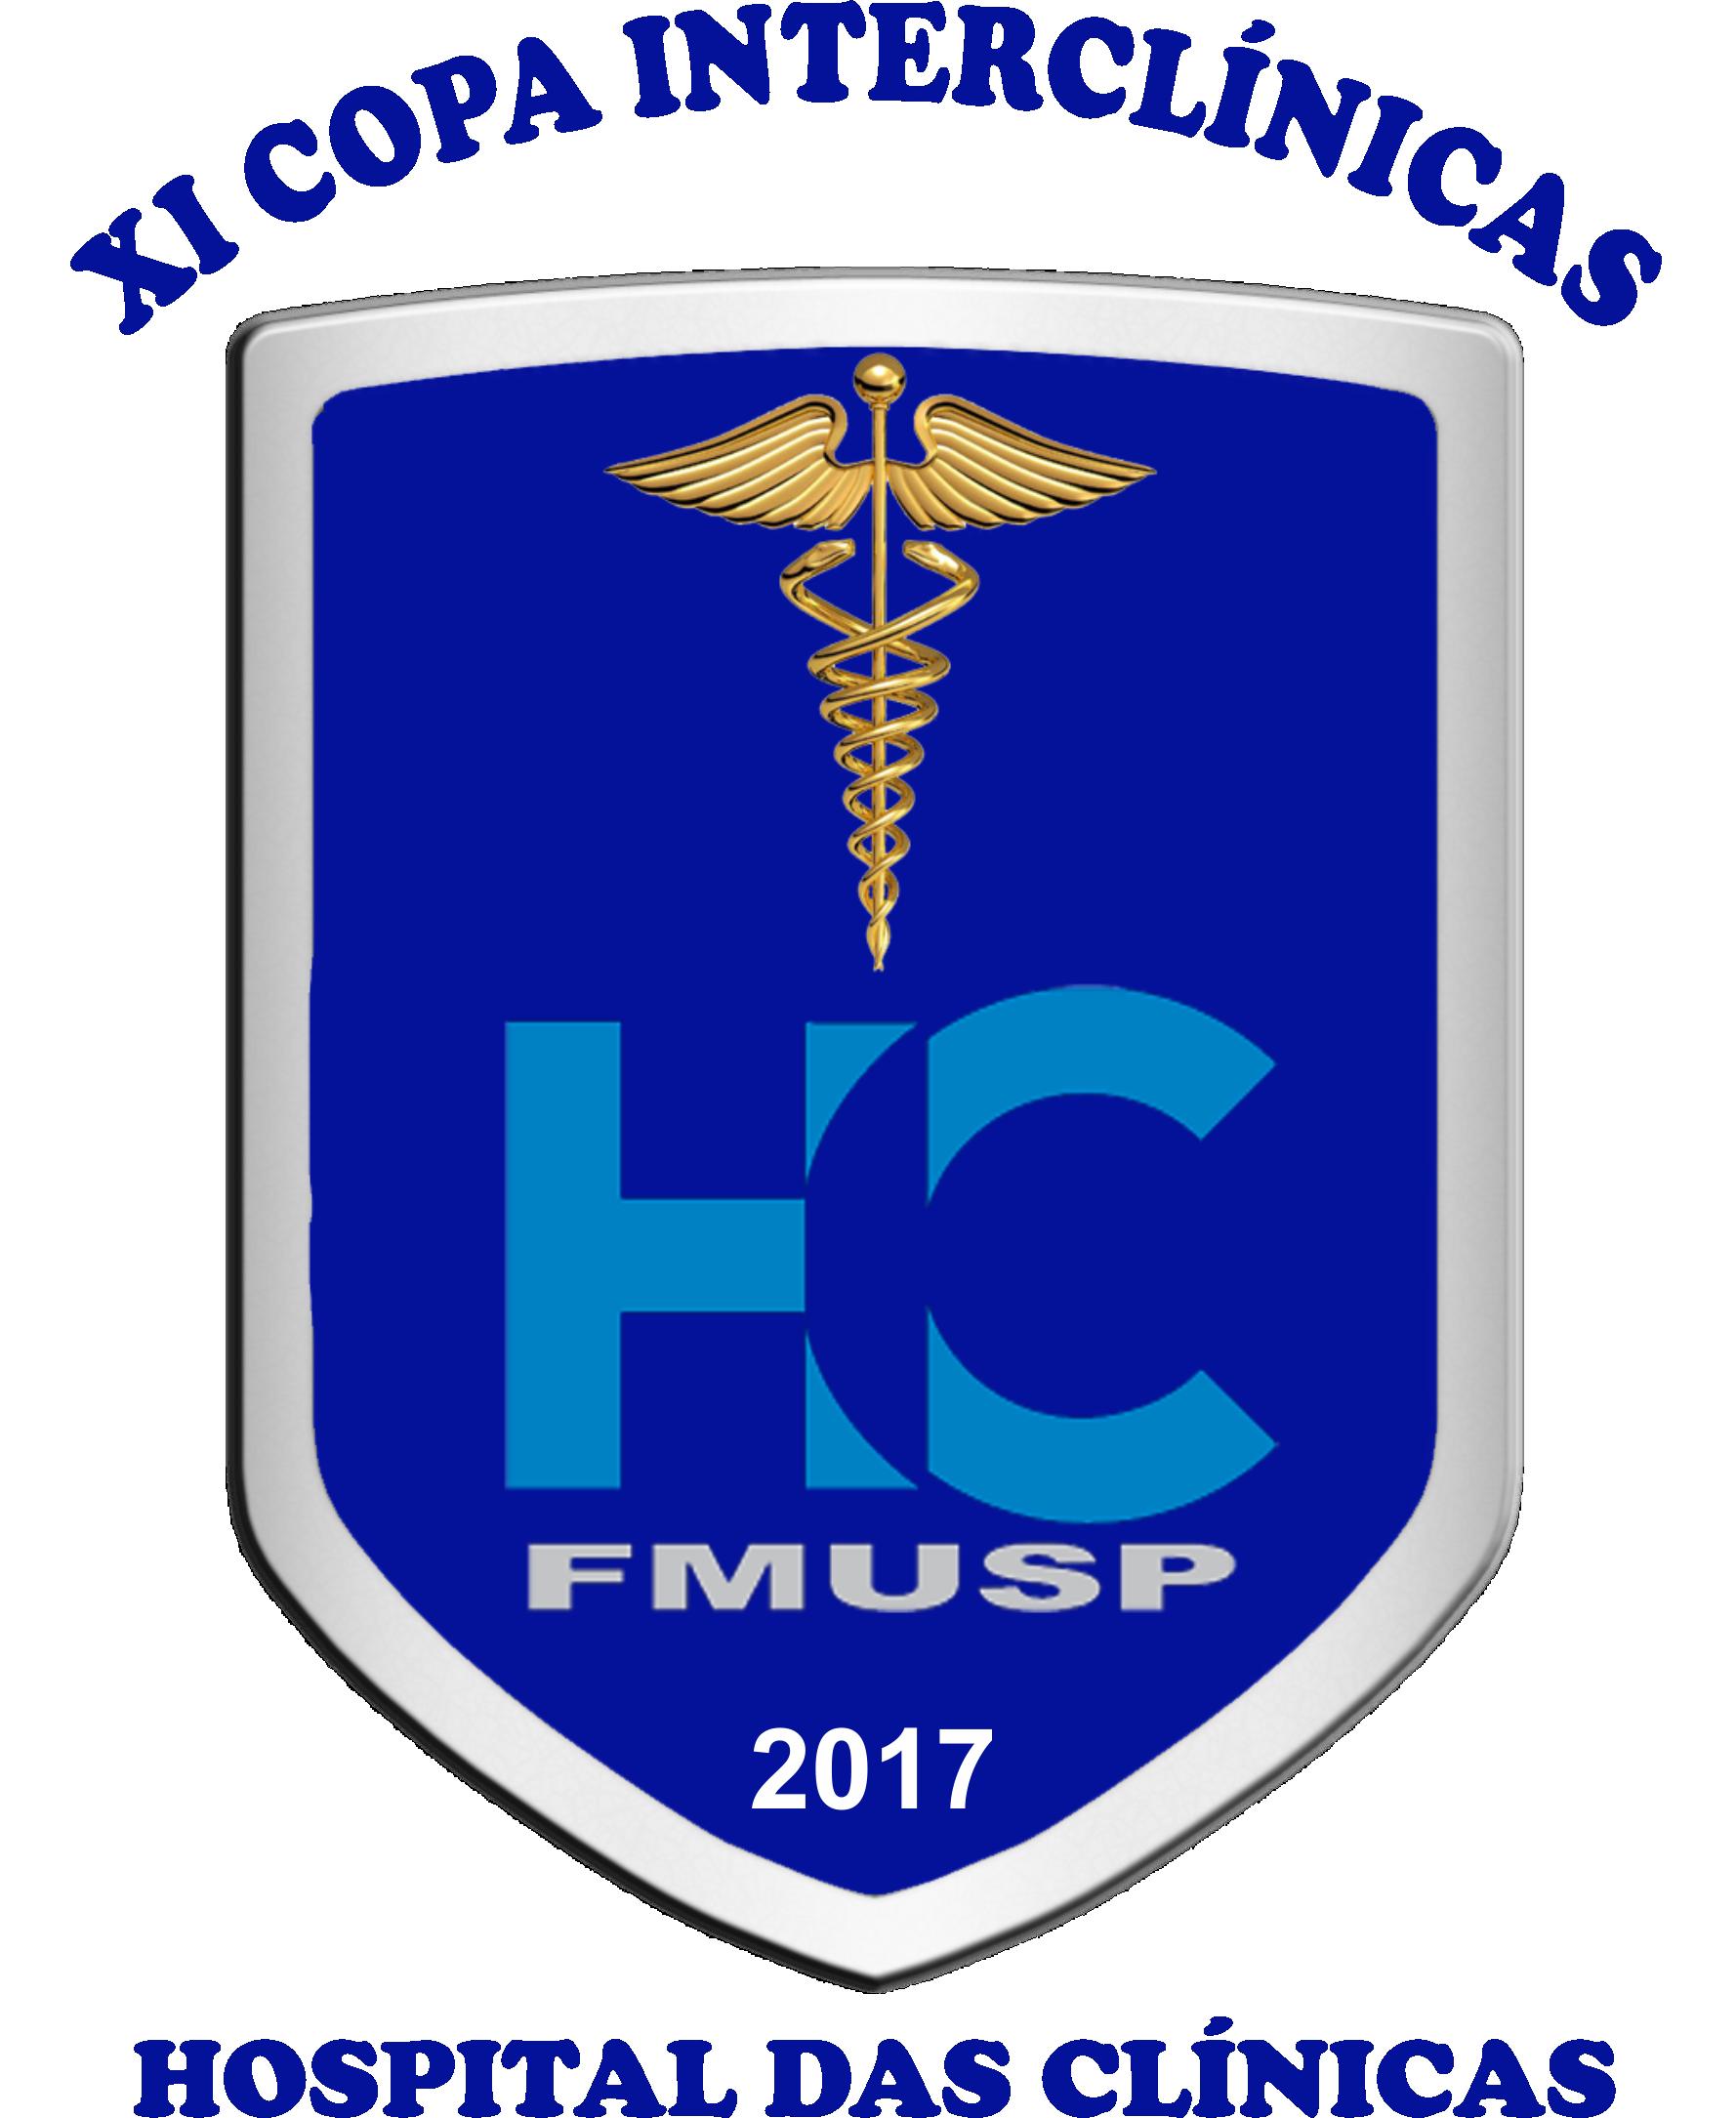 XI Copa Interclinicas do HC de Futebol 7 Society